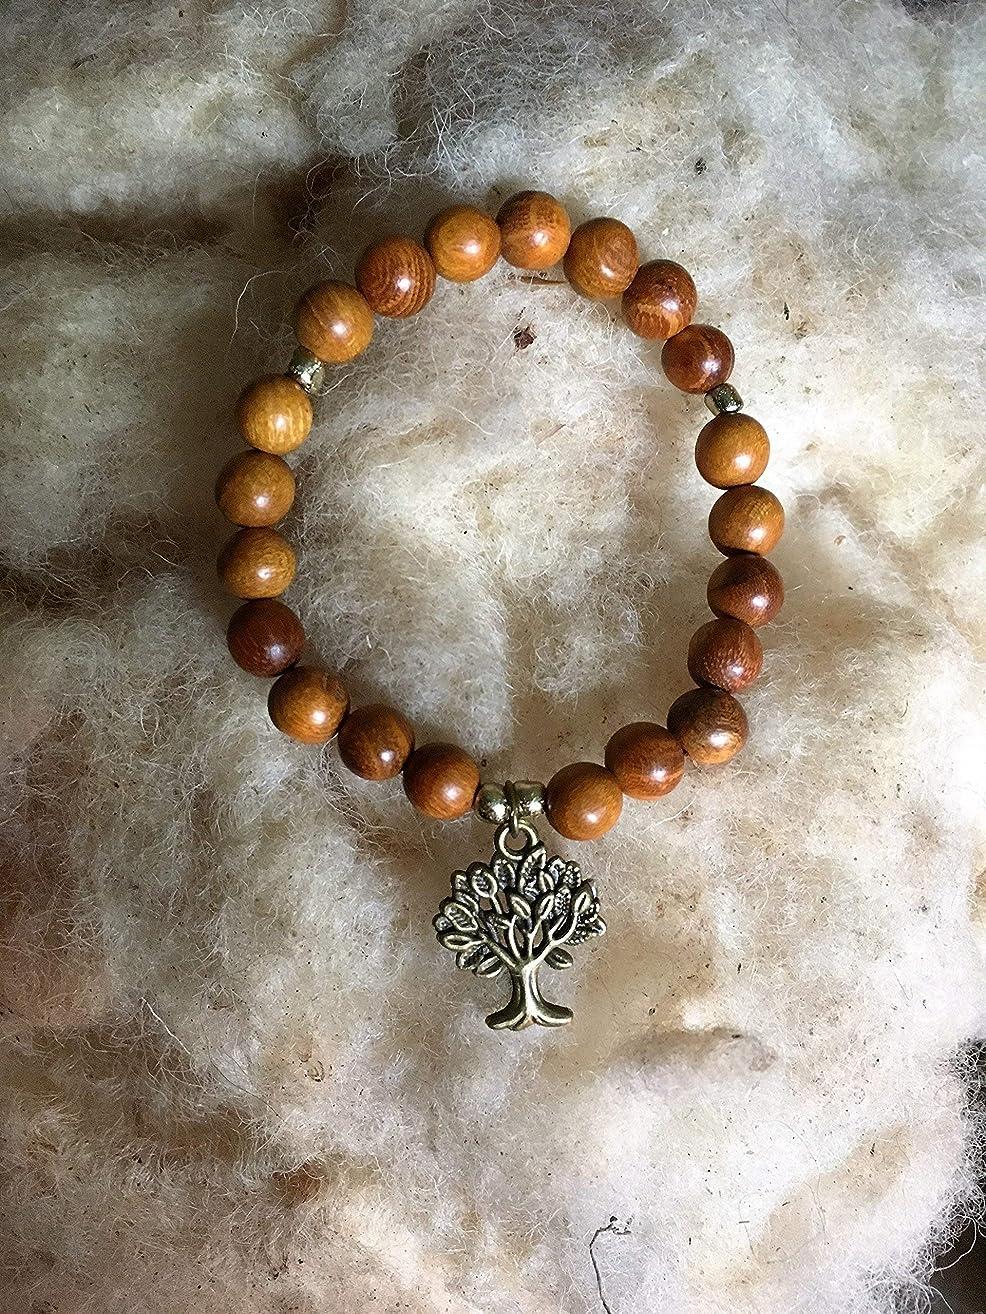 Handmade Sandalwood Bracelet, Tree of Life Charm, Peace | Calming | Protection, 8MM Round Beads